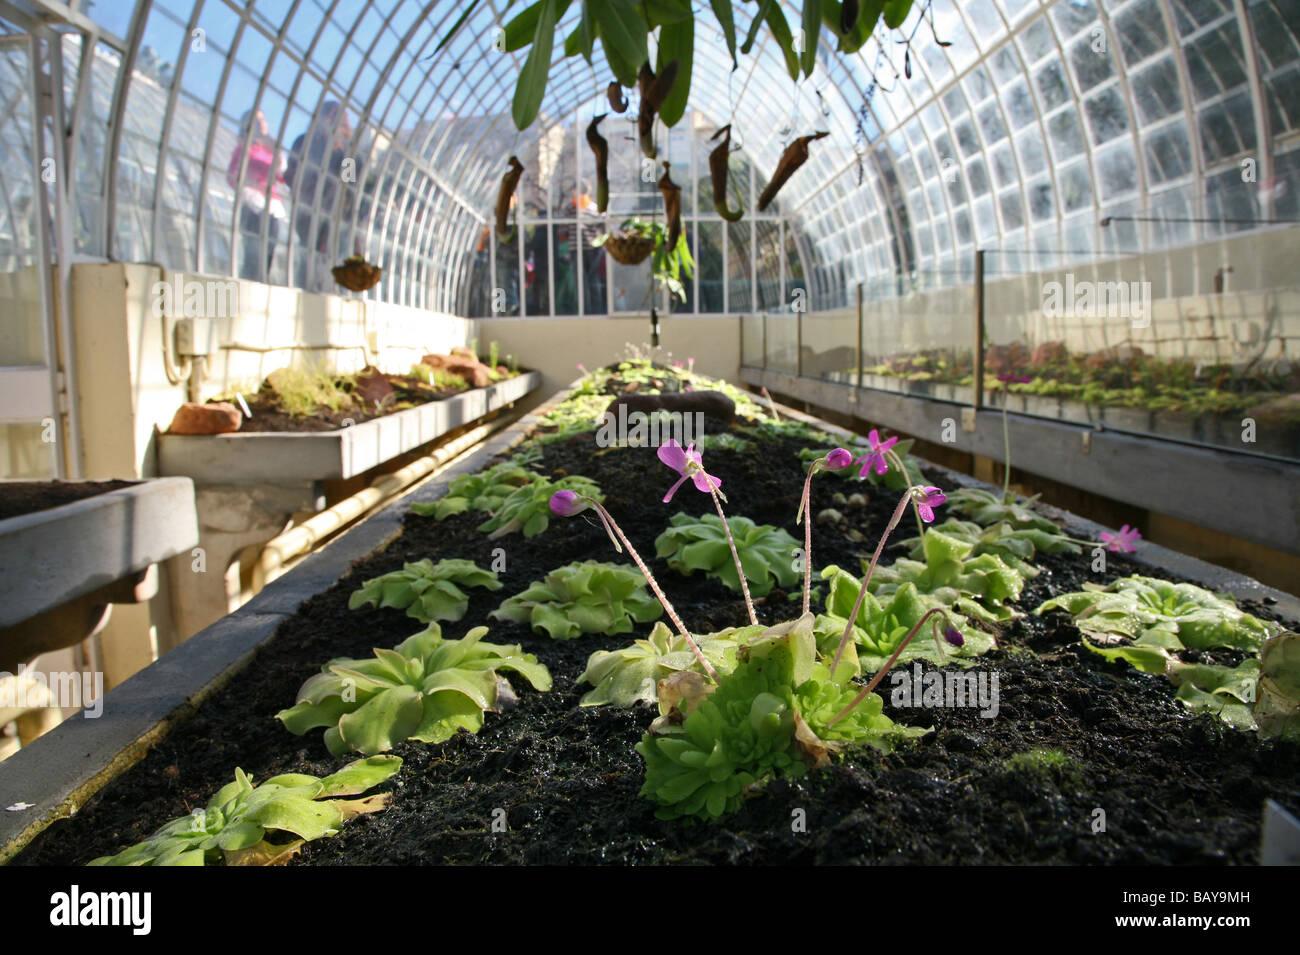 Jardin botanico spain 39 s first botanical garden glass - Jardin botanico valencia ...